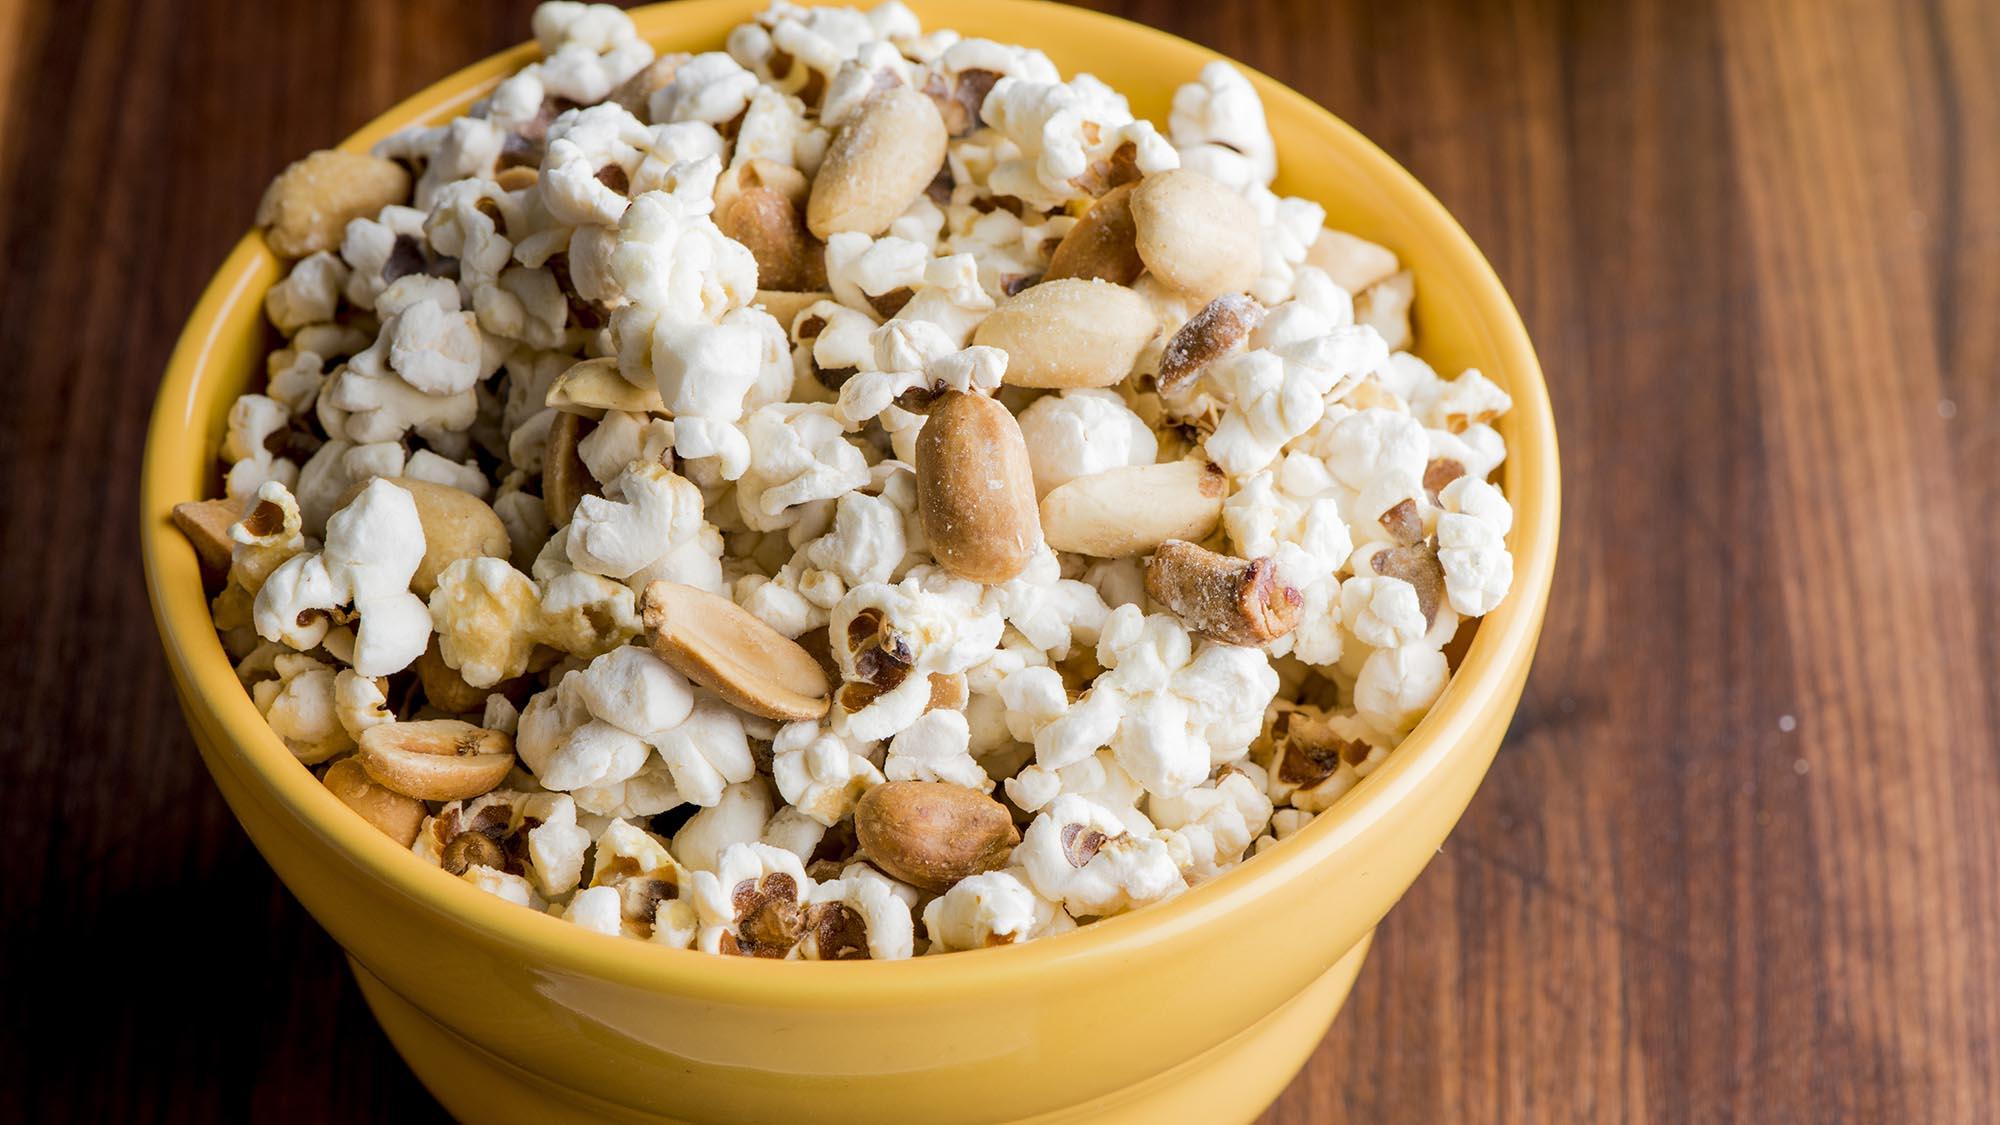 Sweet_Vanilla_Peanut_Popcorn_2000x1125.jpg